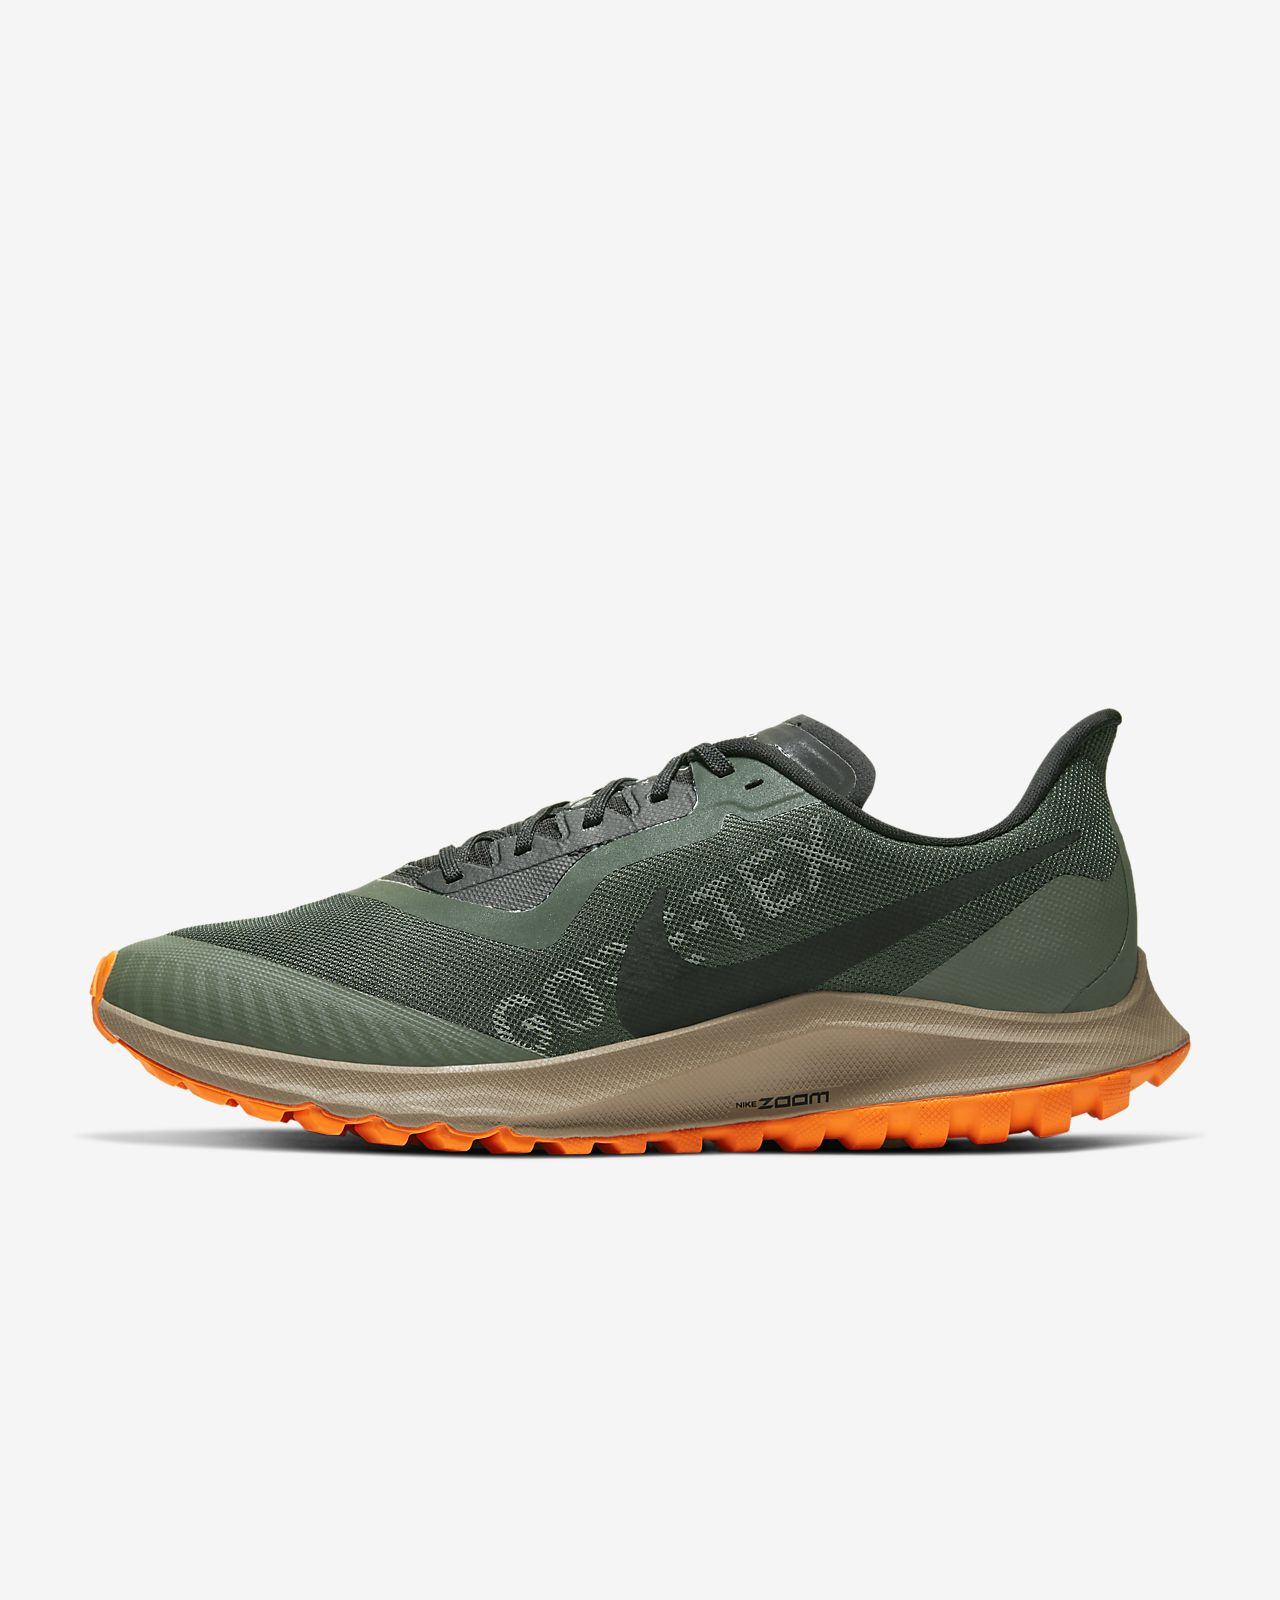 Męskie buty do biegania w terenie Nike Zoom Pegasus 36 Trail GORE-TEX®